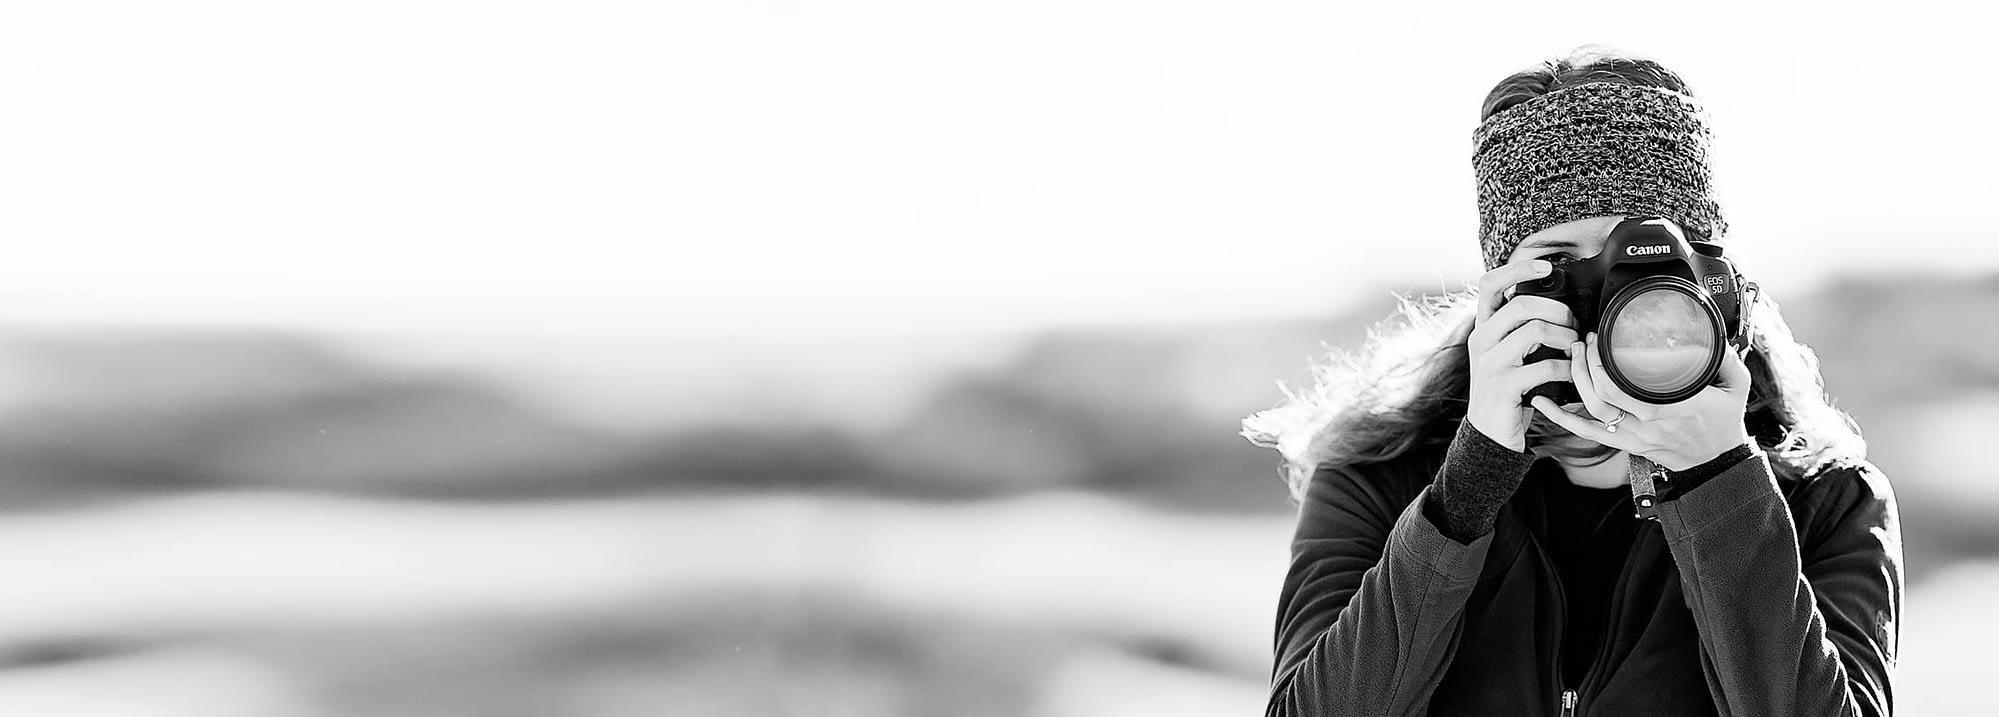 Colorado Adventure Elopement Videographer Elizabeth Mae Films a winter elopement